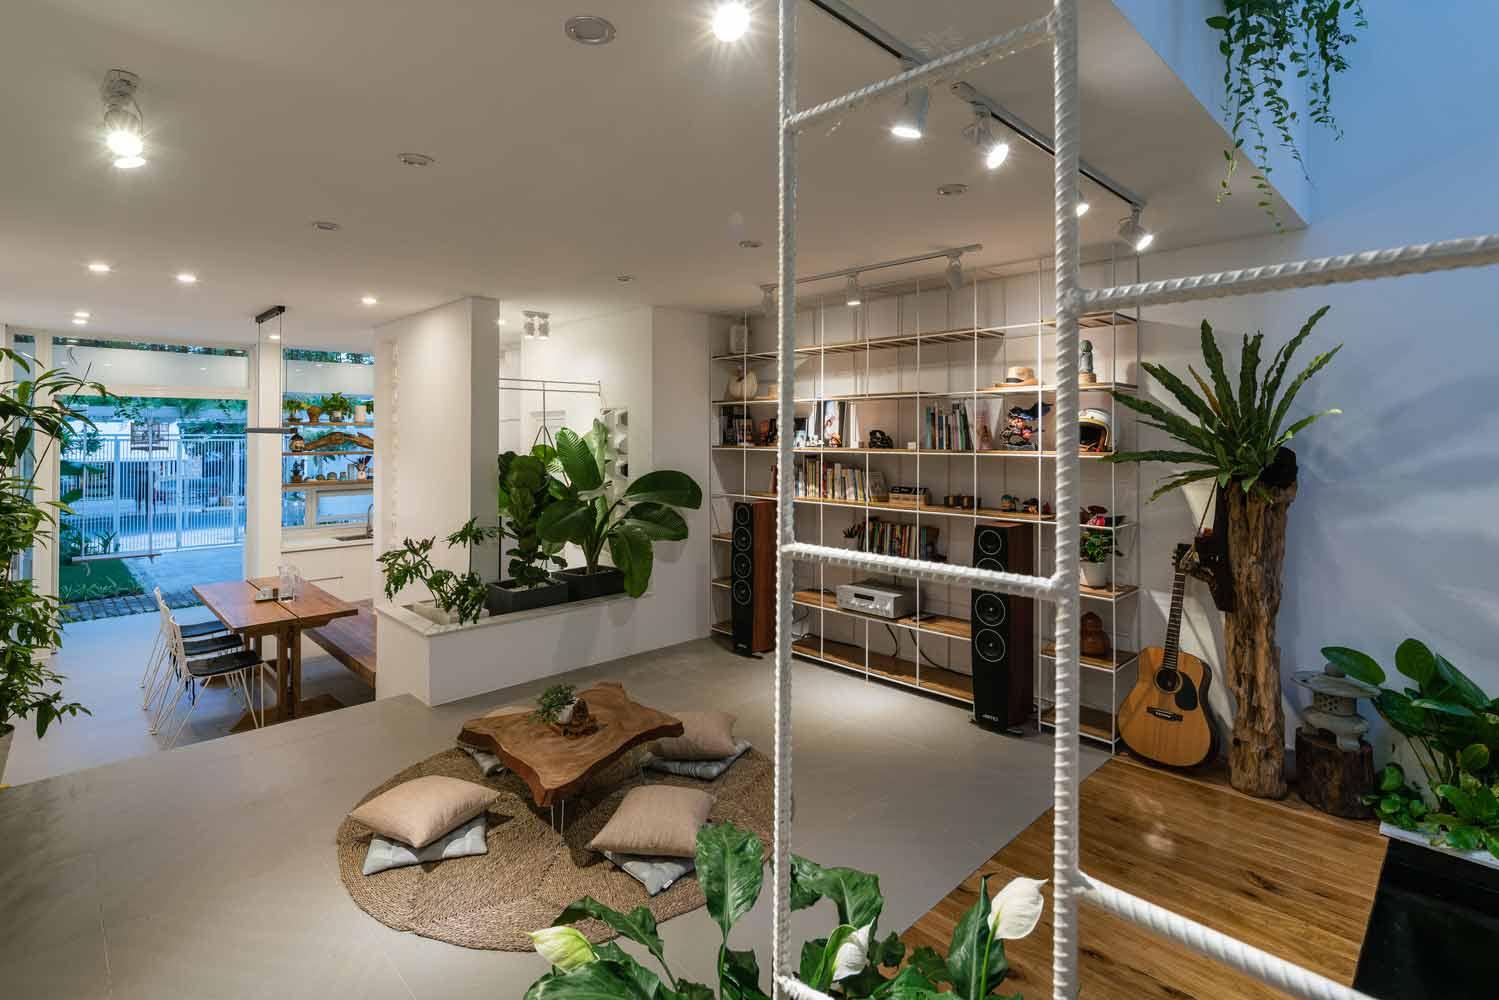 Konsep interior open space yang terintergrasi nan sejuk, karya Q Concept // archdaily.com